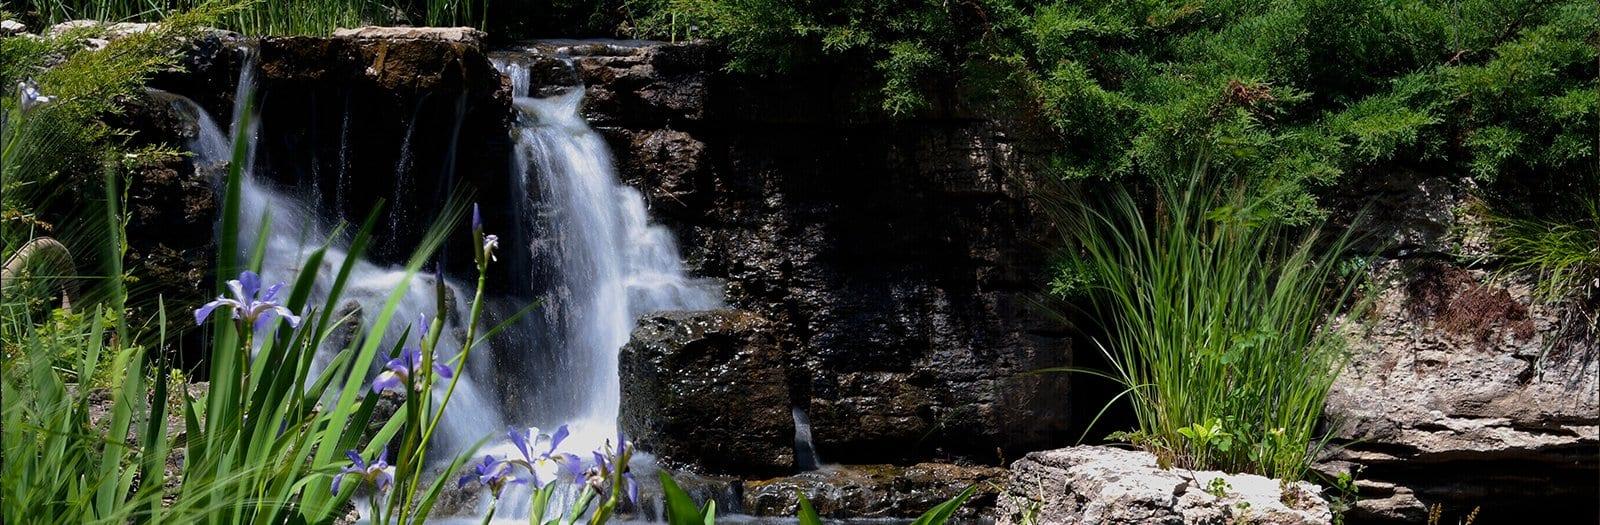 Waterfall banner